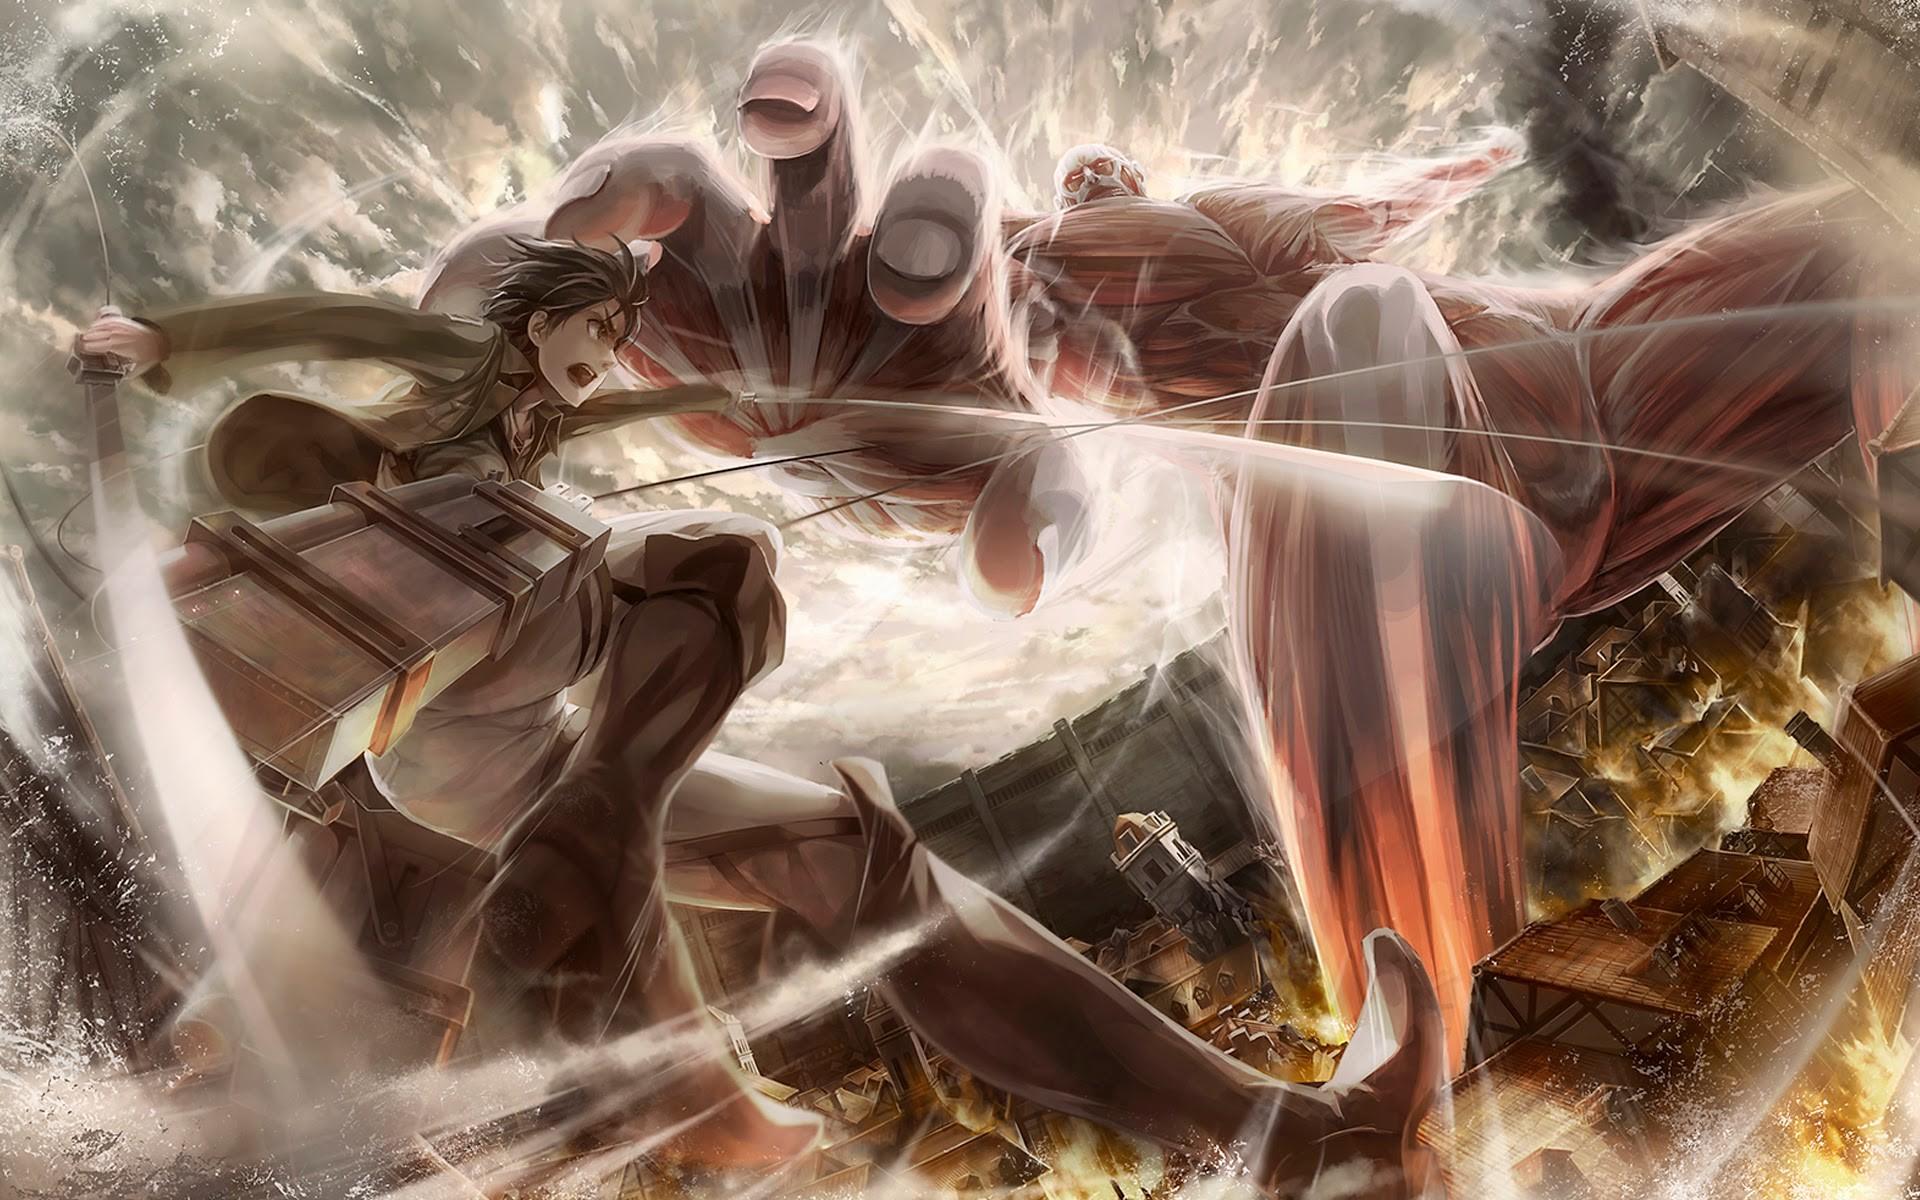 colossal-titan-vs-eren-jaeger-attack-on-titan-hd-wallpaper-1920×1200.jpg  (1920×1200)   Shingeki No Kyojin   Pinterest   Anime fan art and Anime